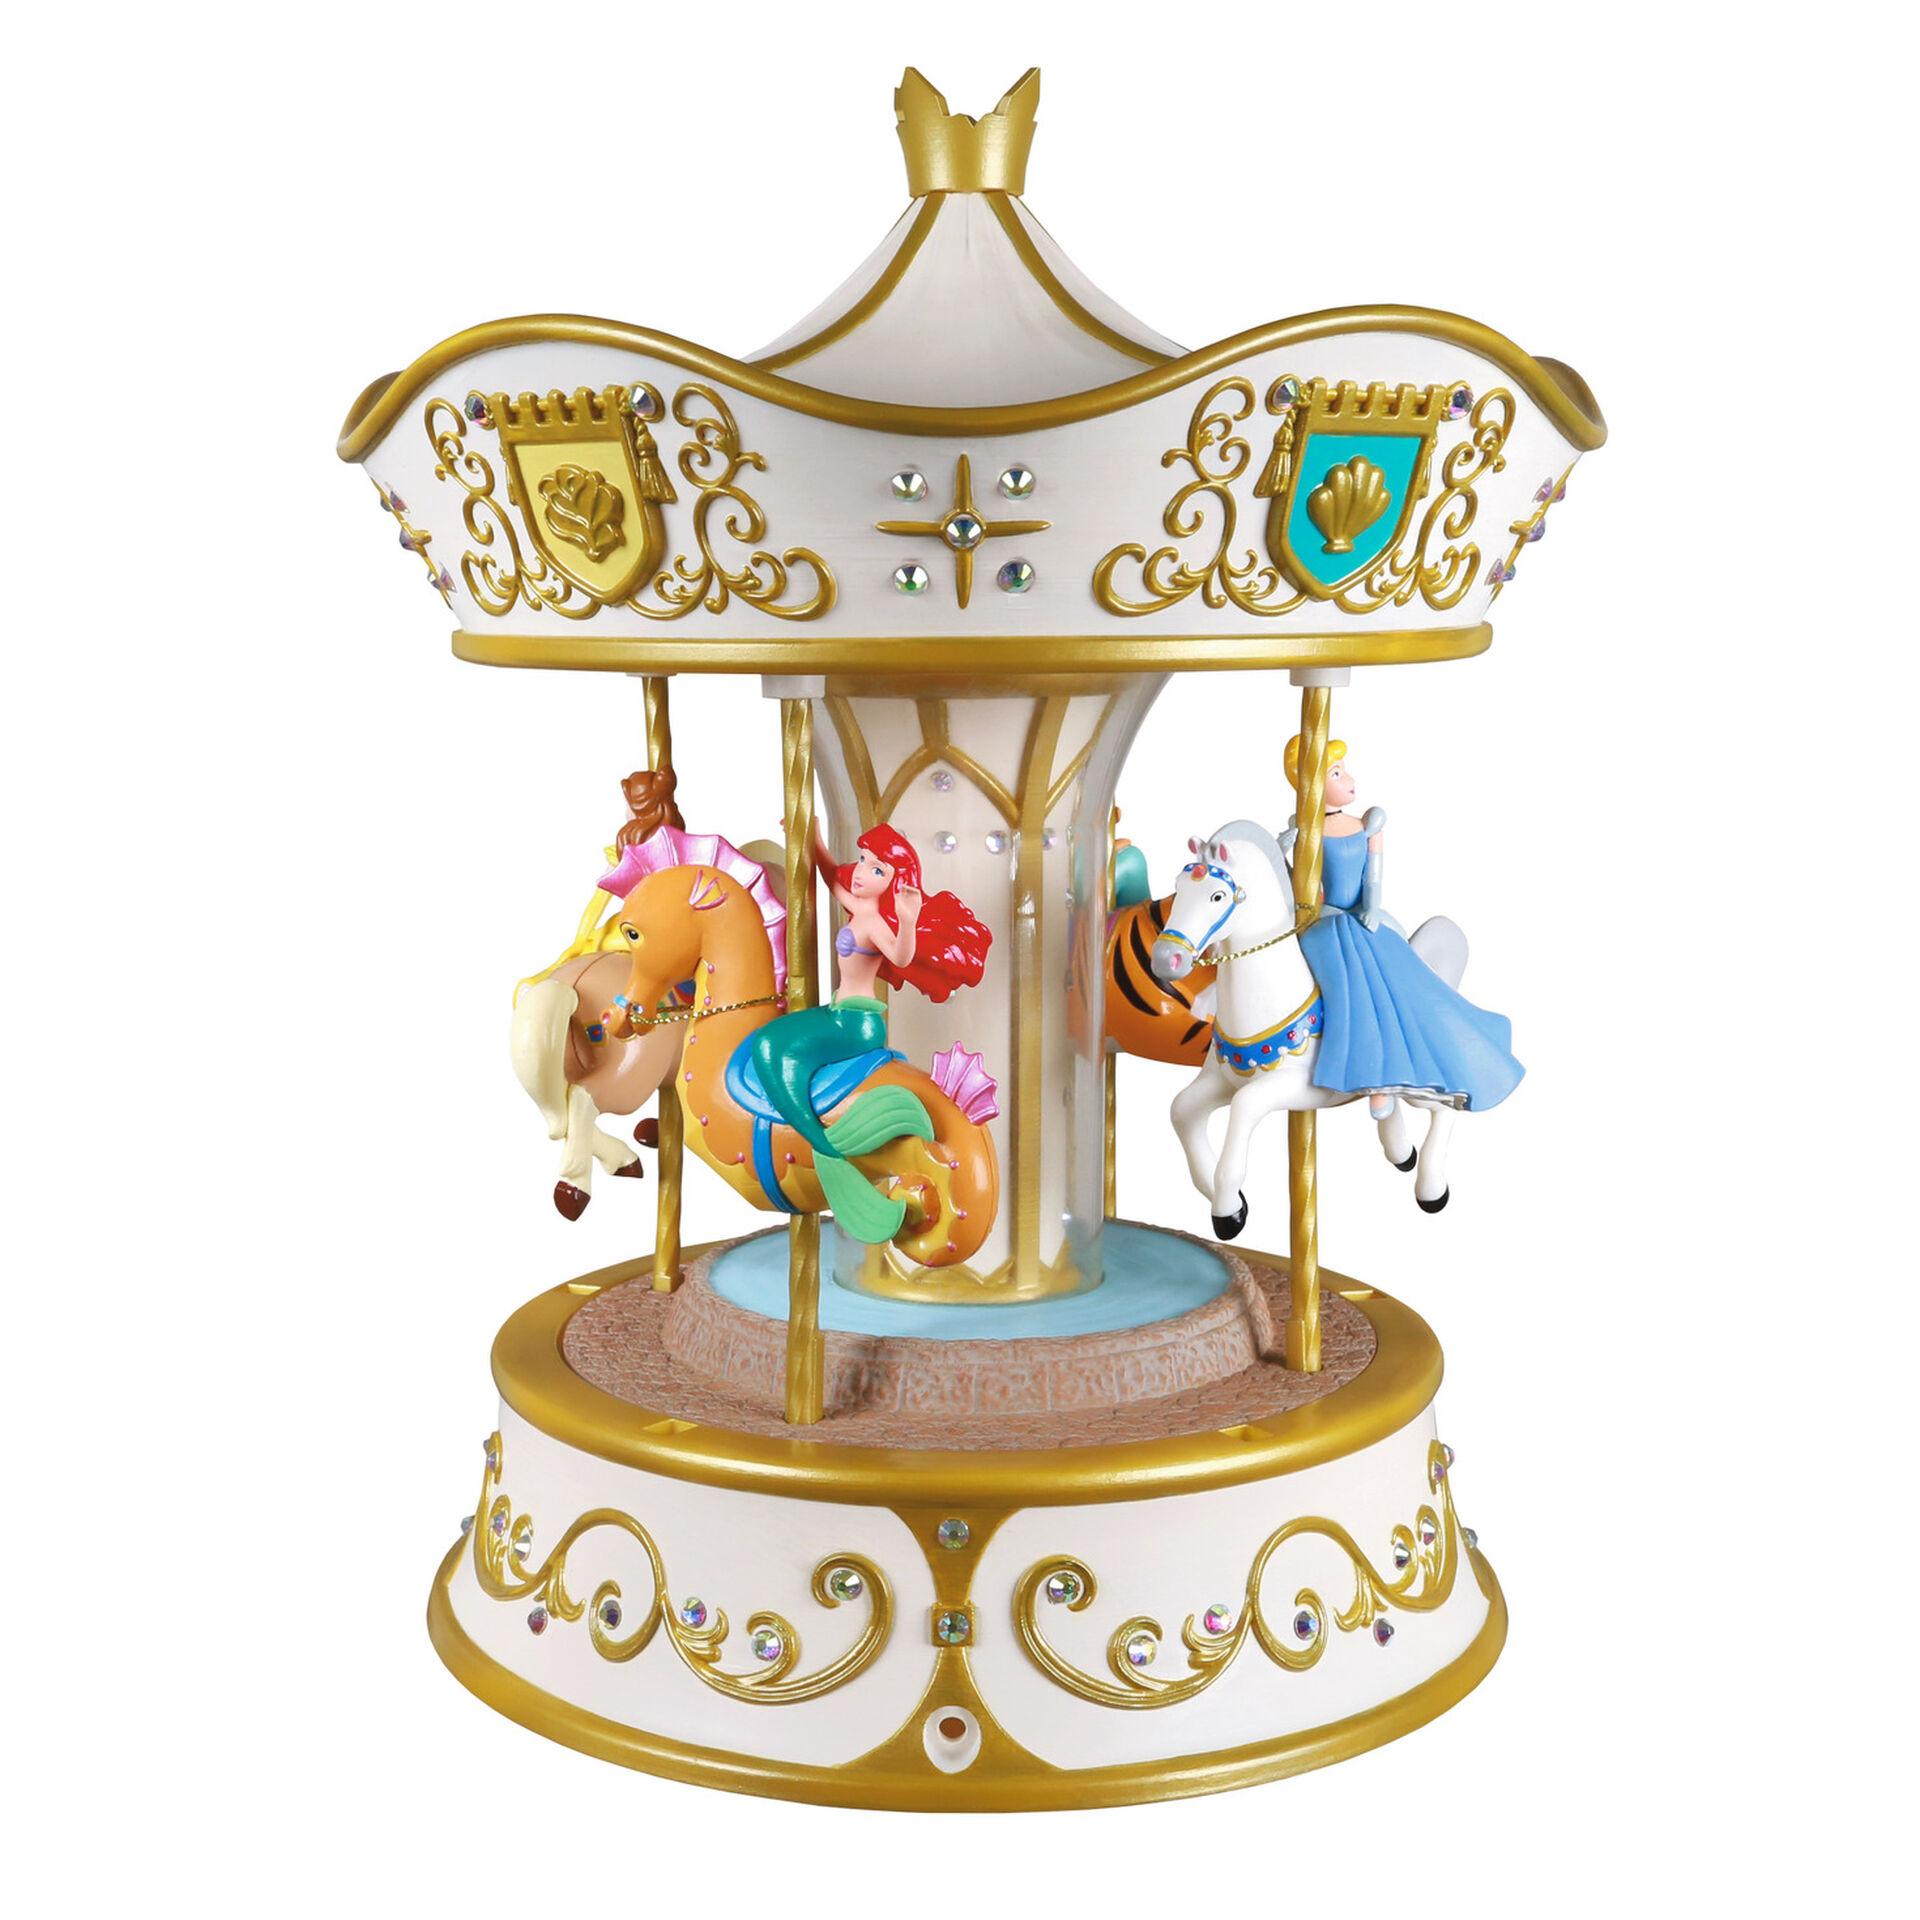 Christmas Carousel Recreation 2021 2020 Disney Princess Dreams Go Round Hallmark Christmas Ornament Hooked On Hallmark Ornaments